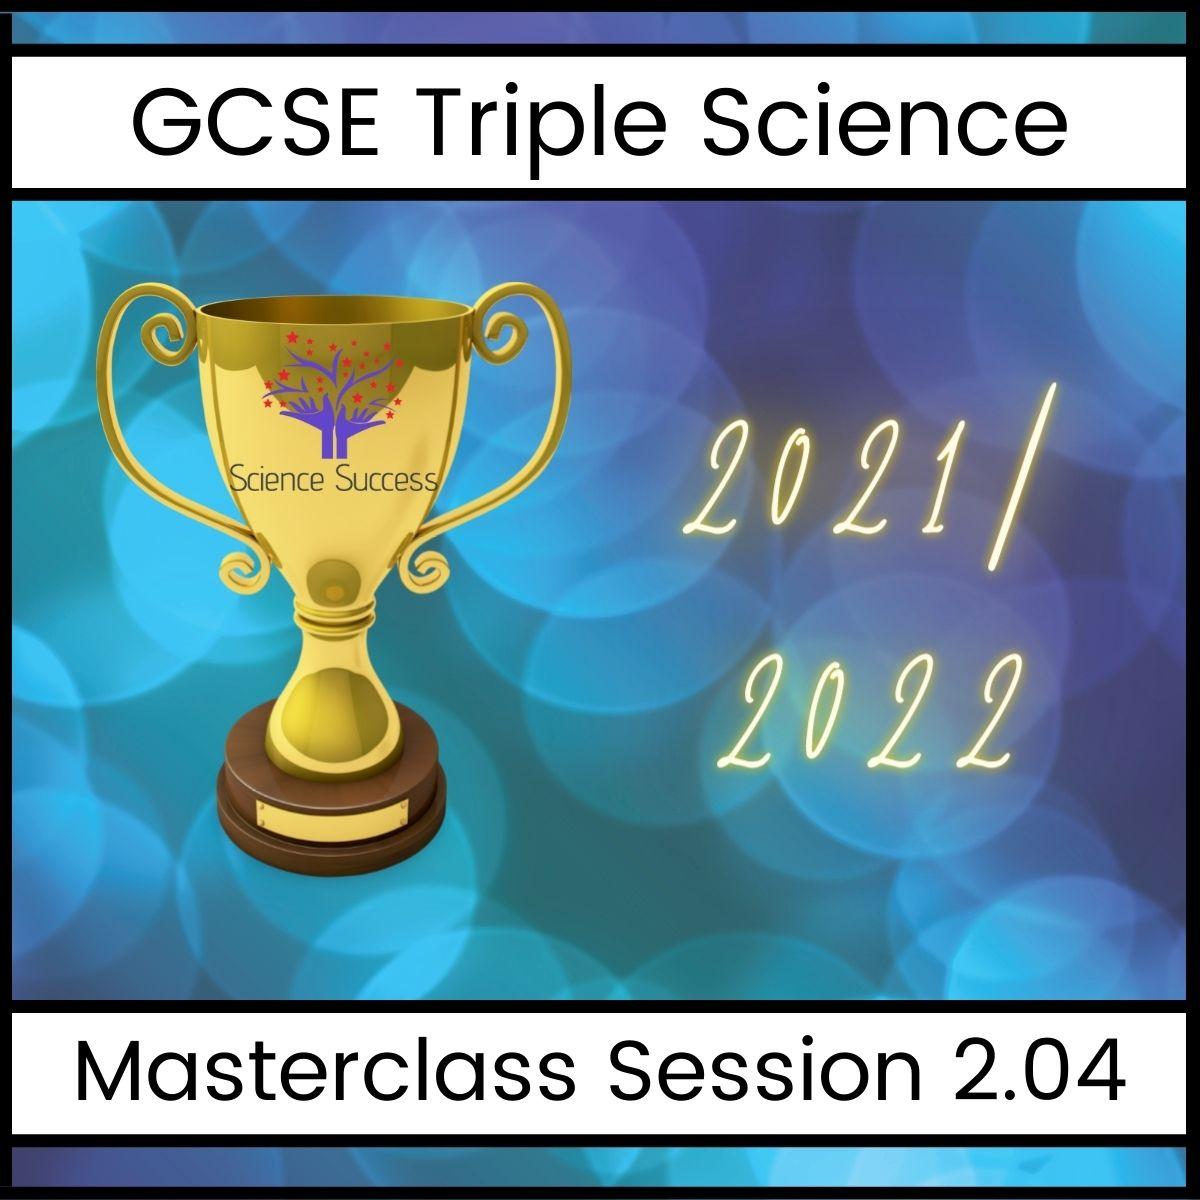 2.04 T 202122